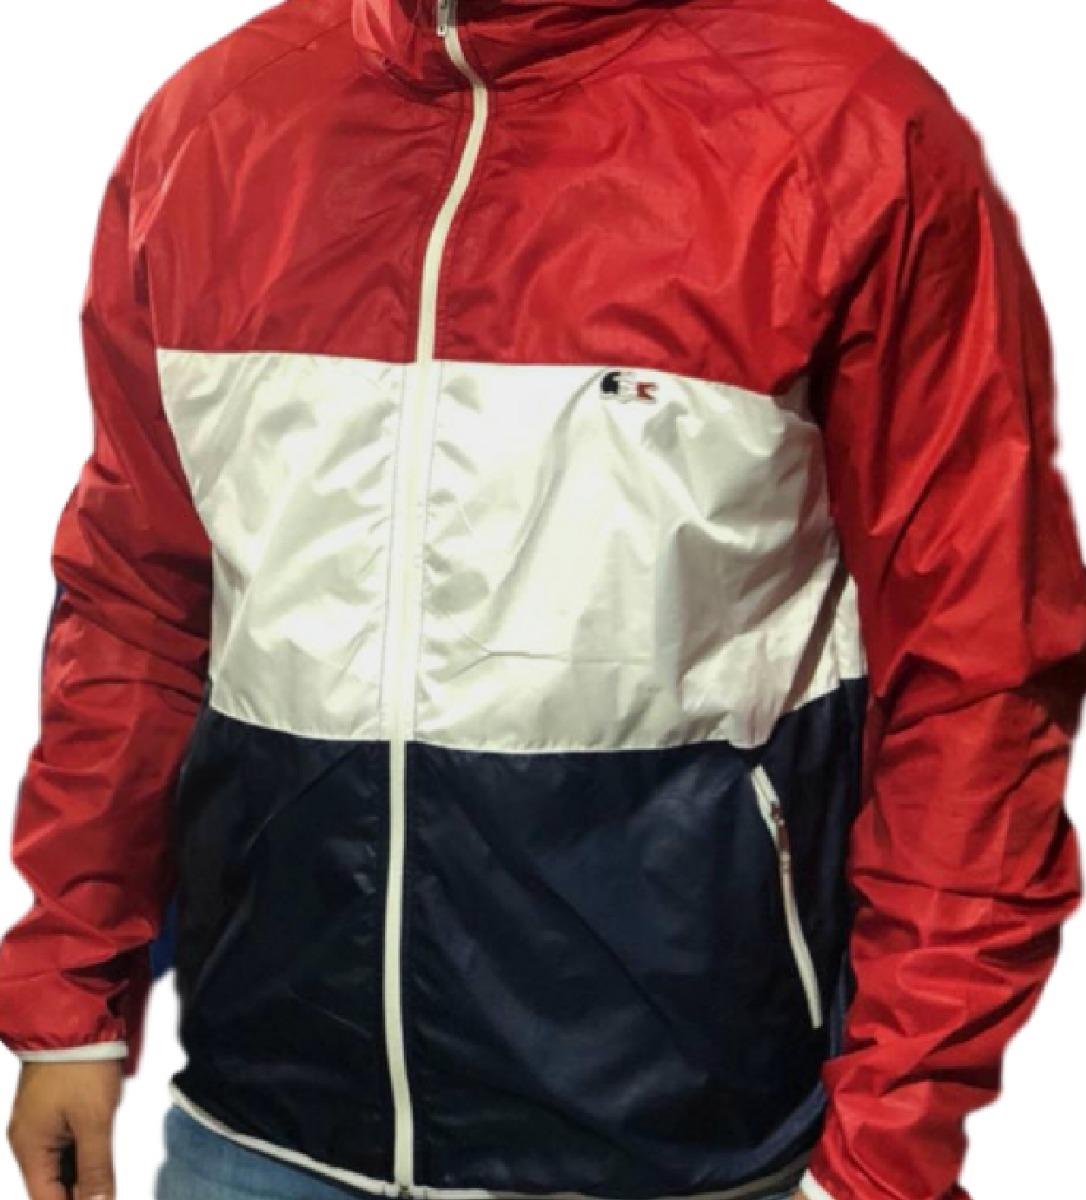 casaco corta vento lacoste masculino promoção cores variadas. Carregando  zoom. 28ef58c070